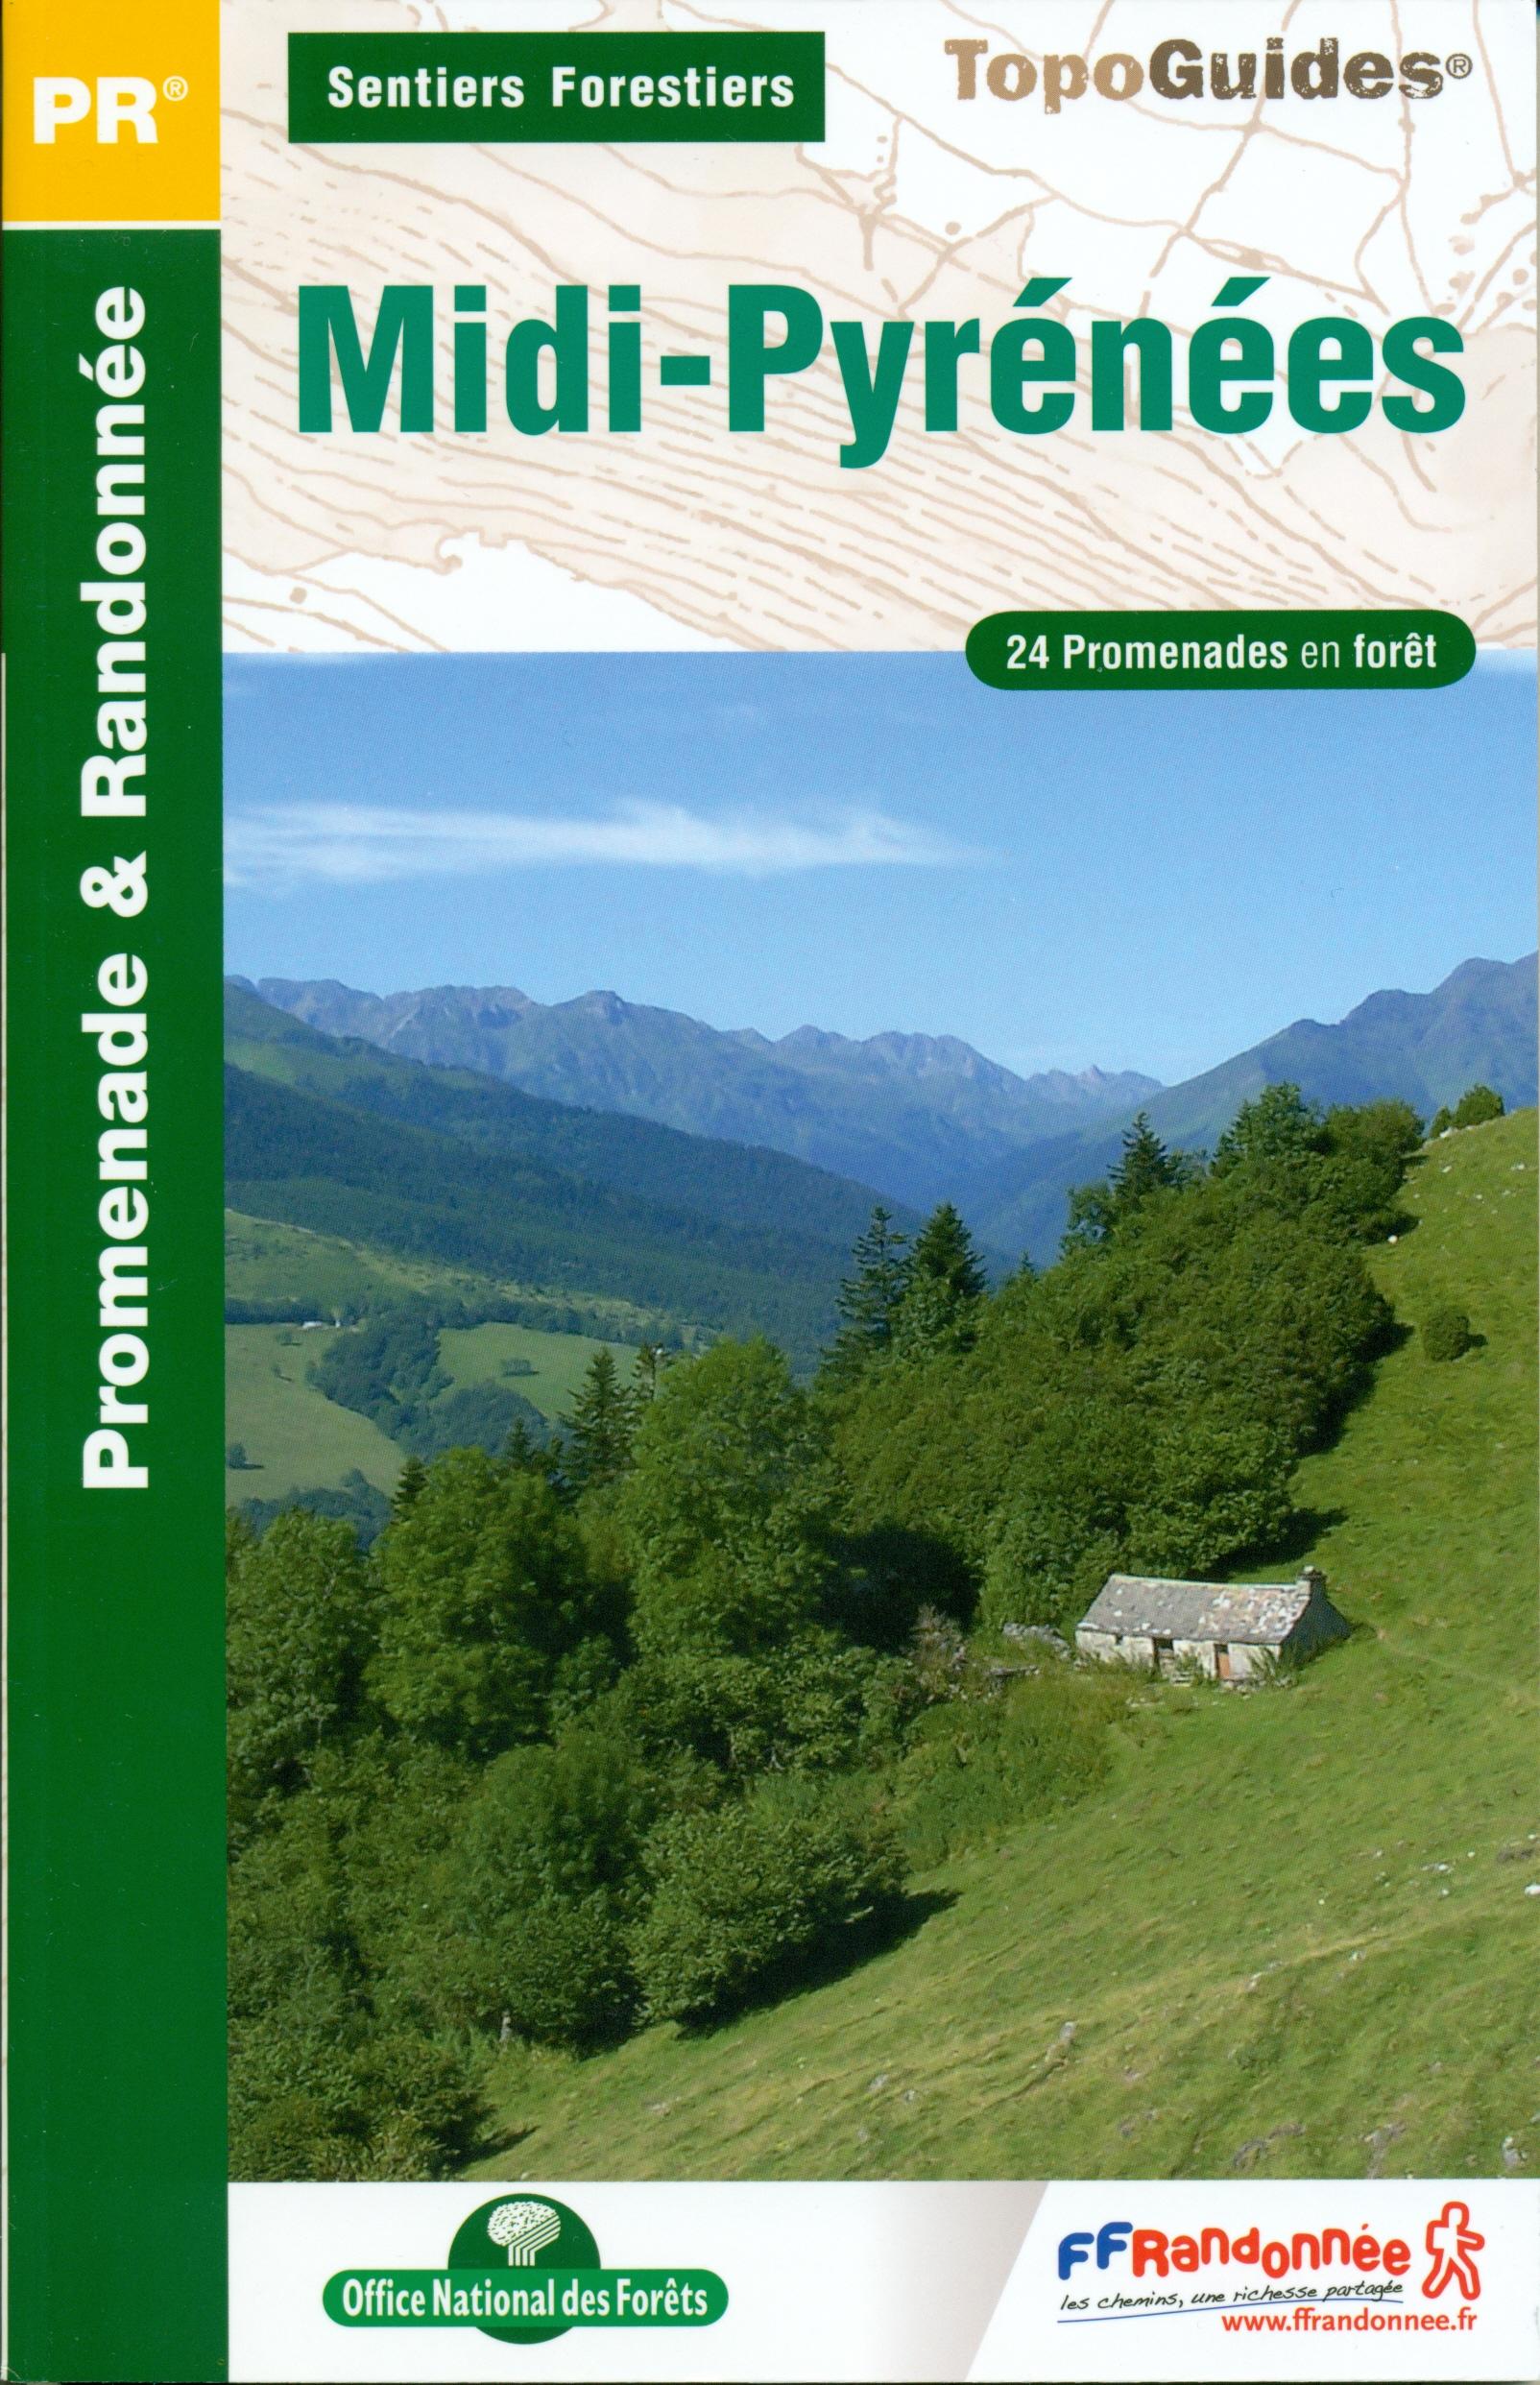 Calendrier Randonnee Pedestre Lot Et Garonne.Sentiers Forestiers En Midi Pyrenees A Pied Randonnee